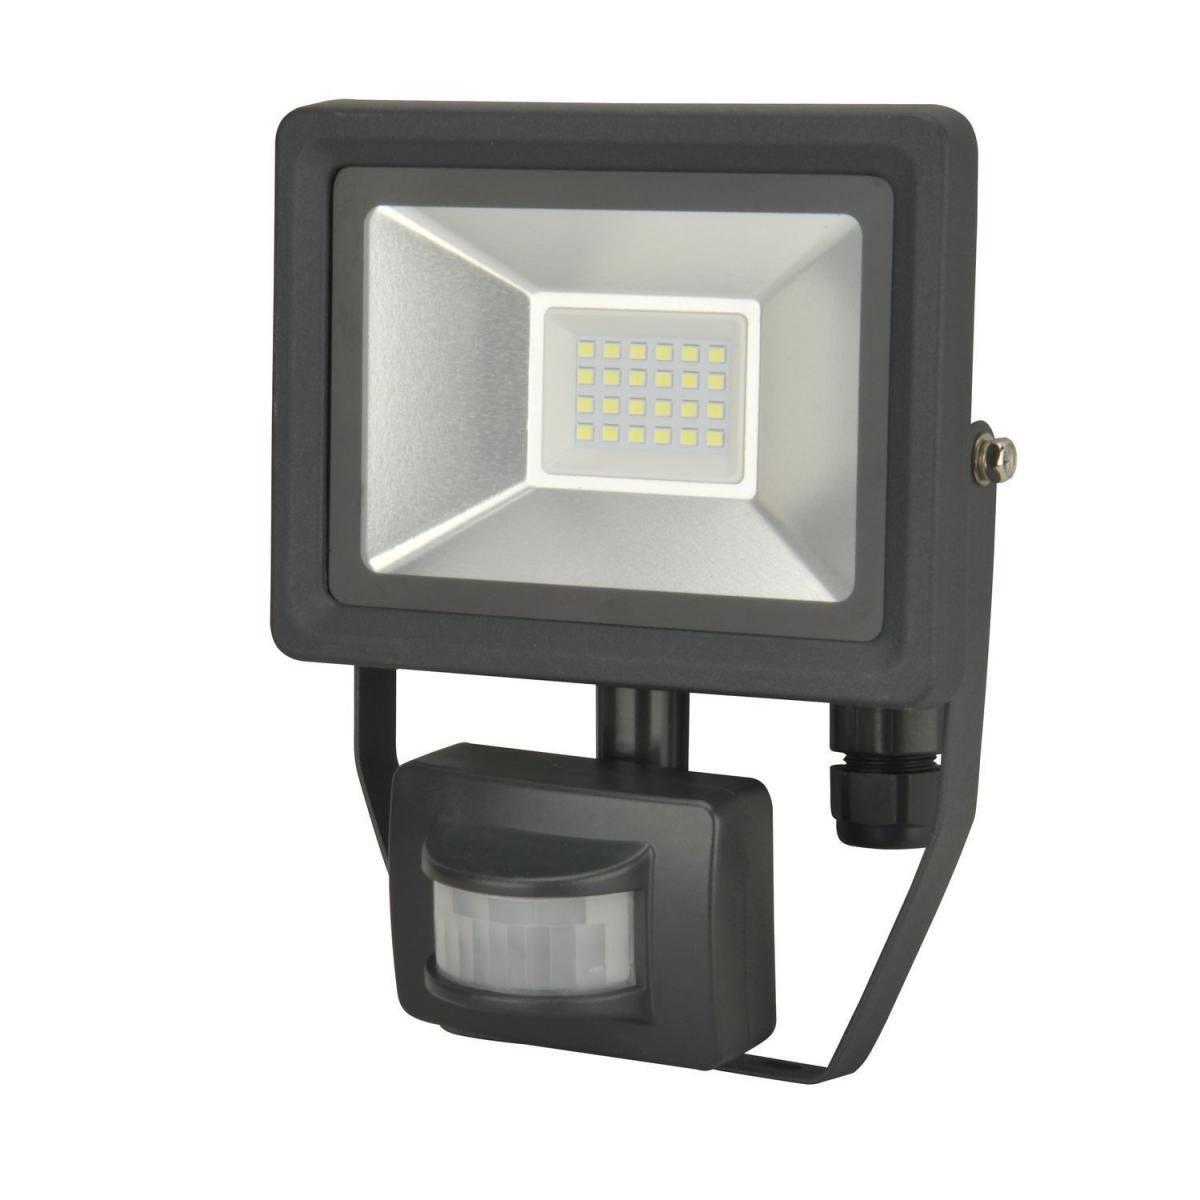 /Strahler LED theleda E20/WH Bewegungsmelder 180o wei/ß 12/m Theben 1020913/